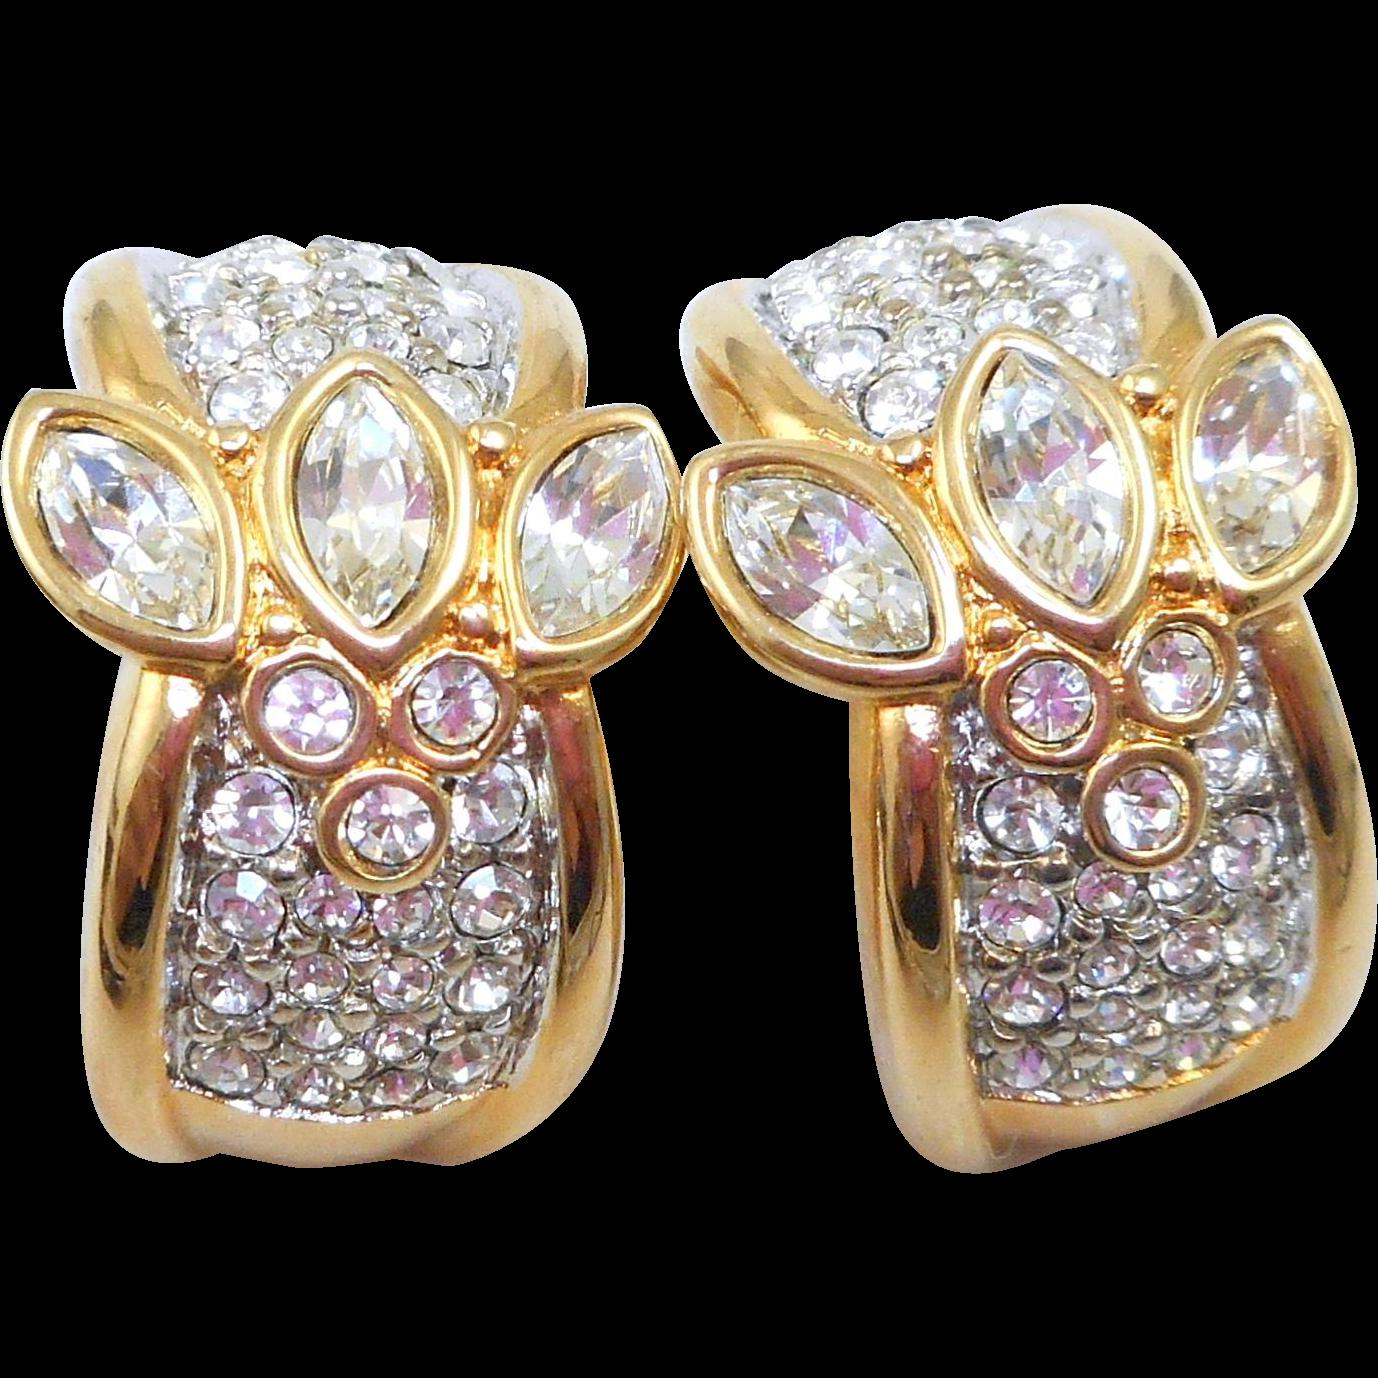 NOS Swarovski Rhinestone Earrings - MOC